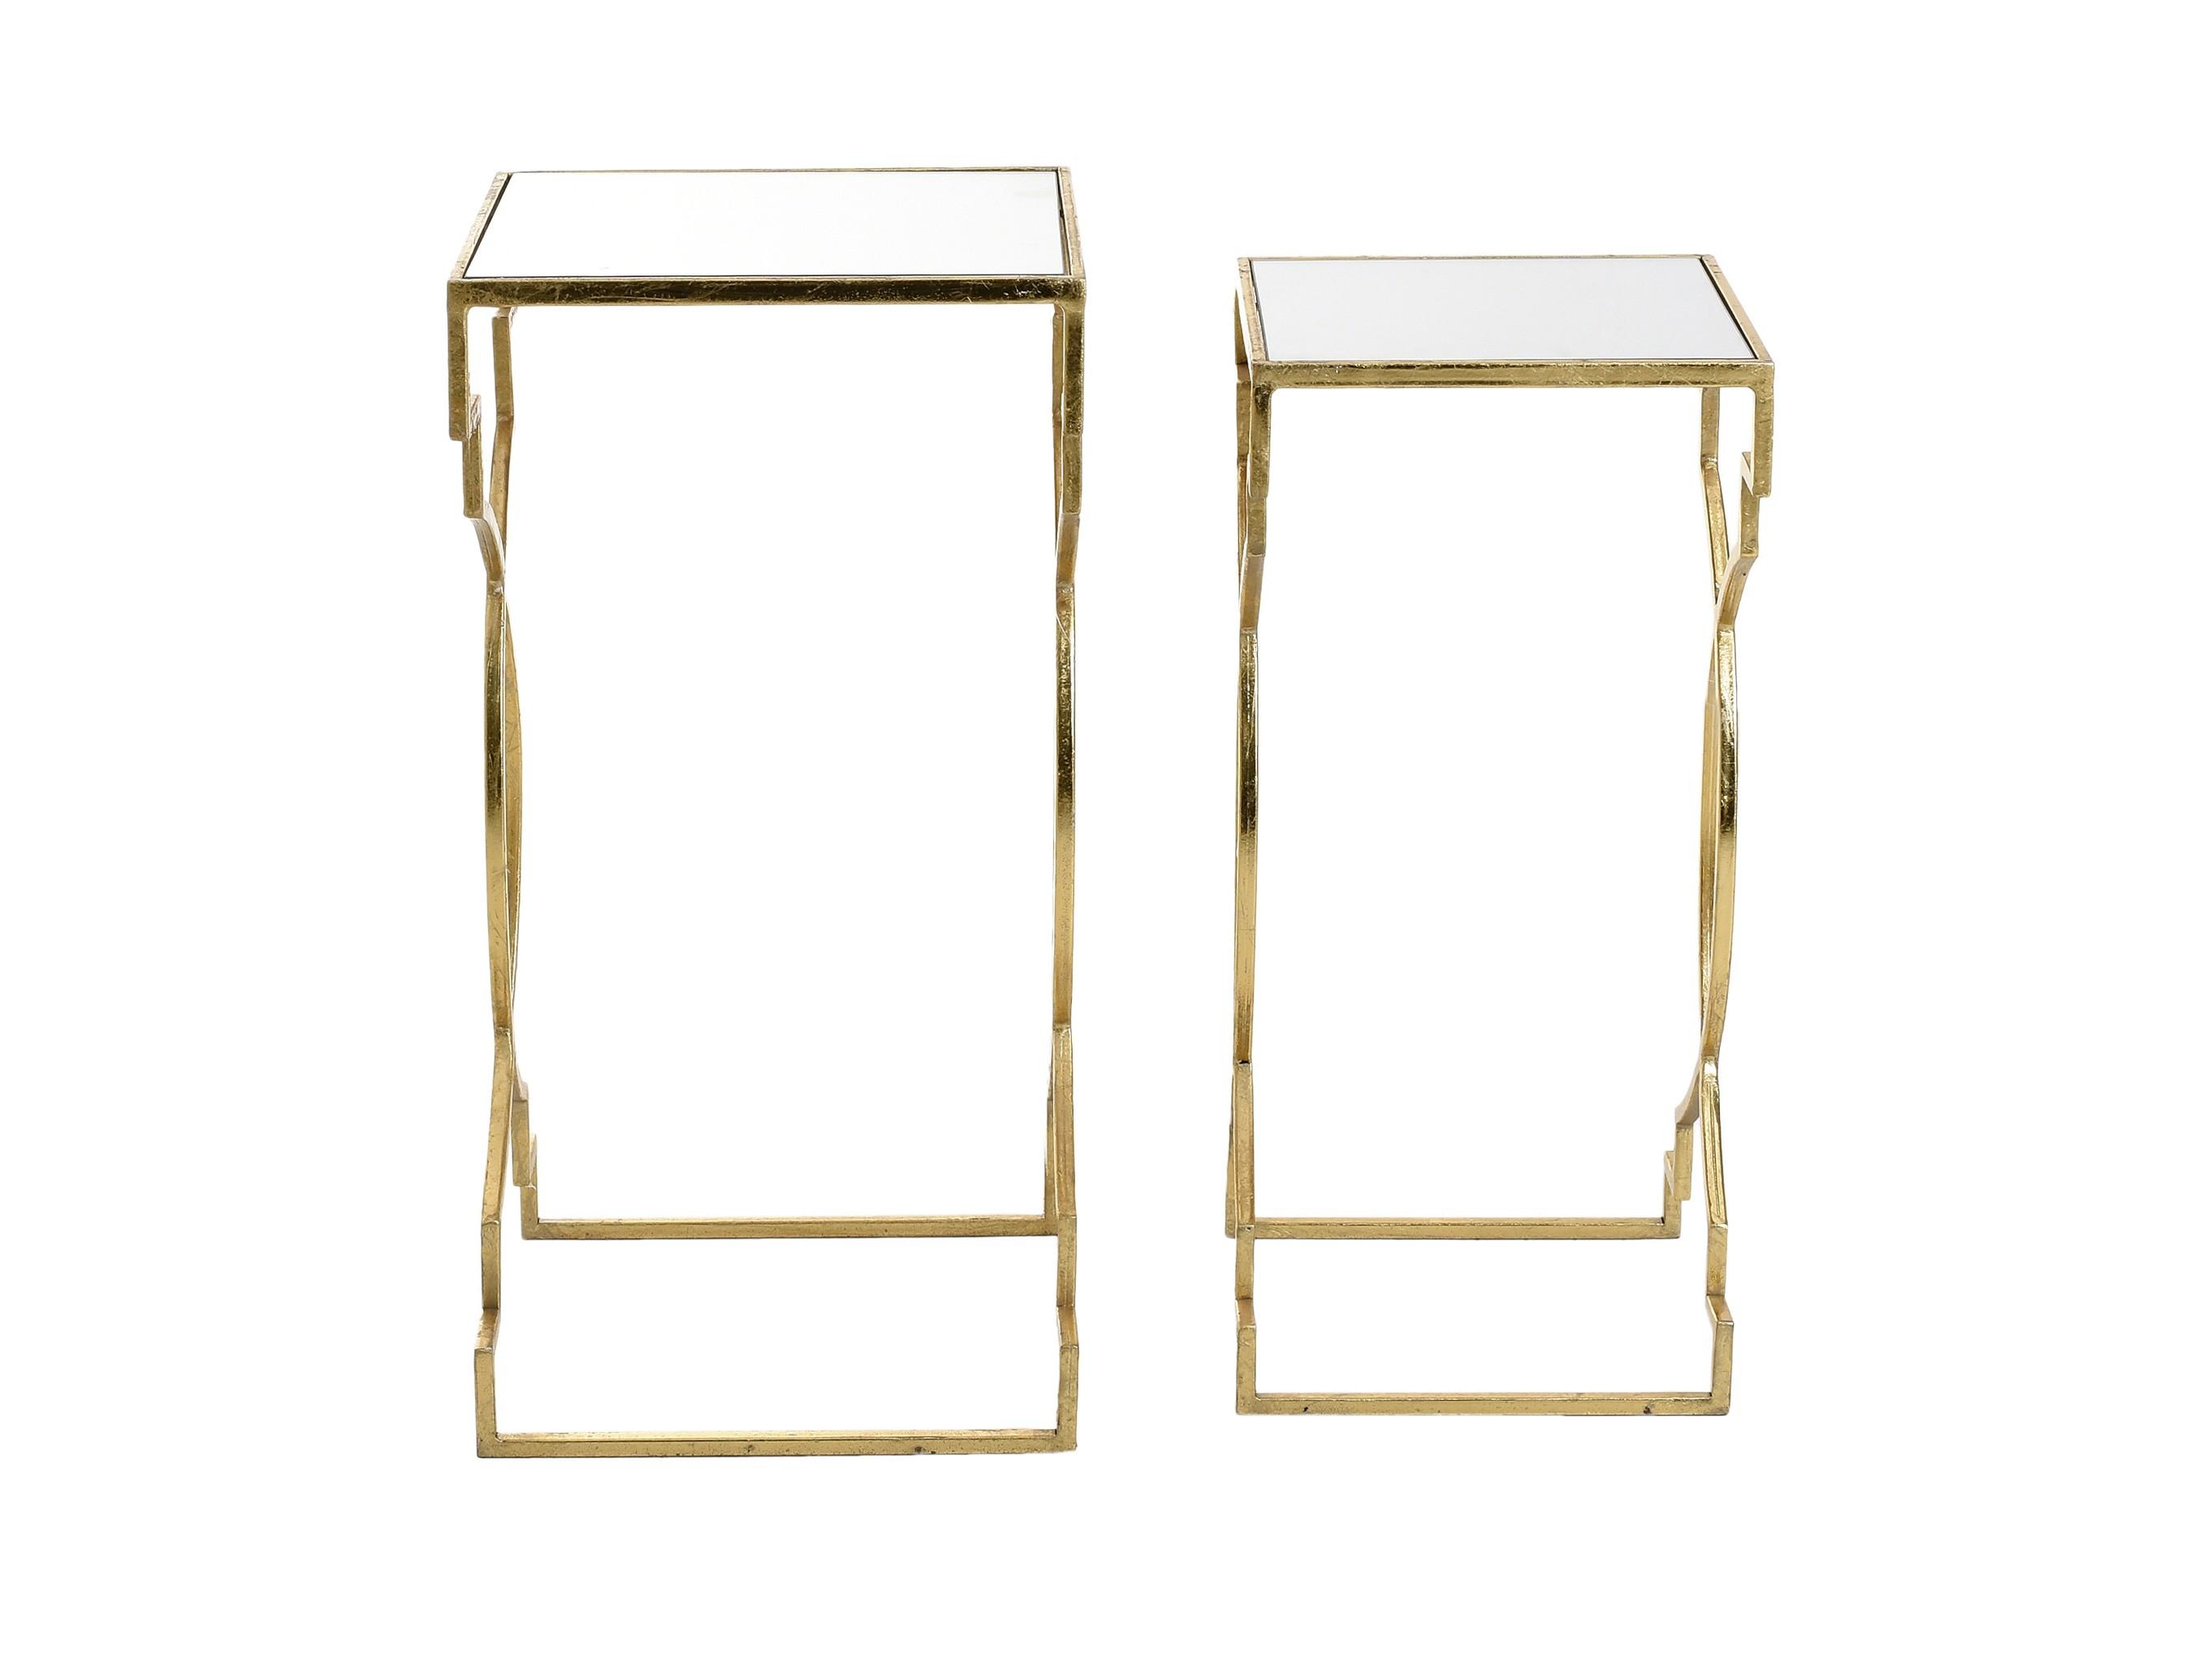 Набор столиков Aristokles (2 шт)Приставные столики<br>Размеры:30.5 X 30.5 X 61 см. 27 Х 27 Х 55 см.